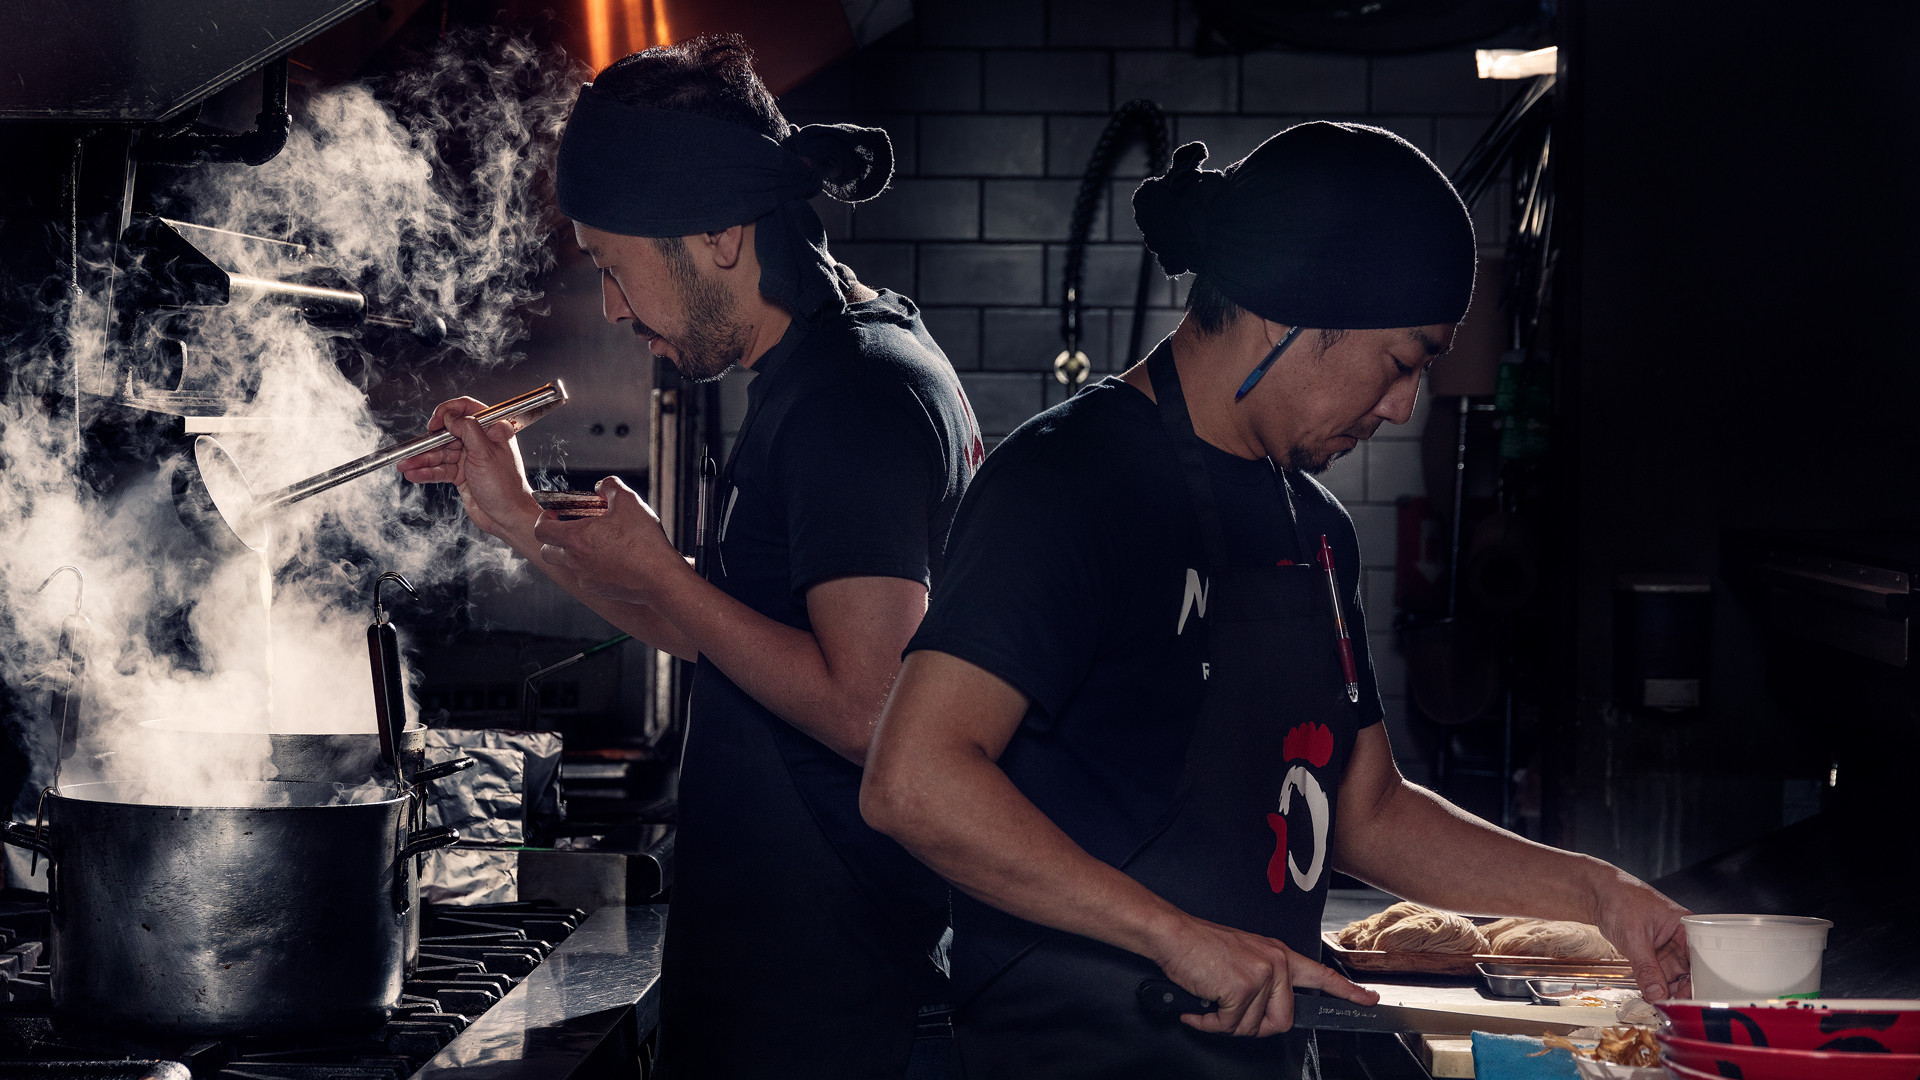 The best new restaurants in Toronto | Chefs cook steaming hot ramen at Midori